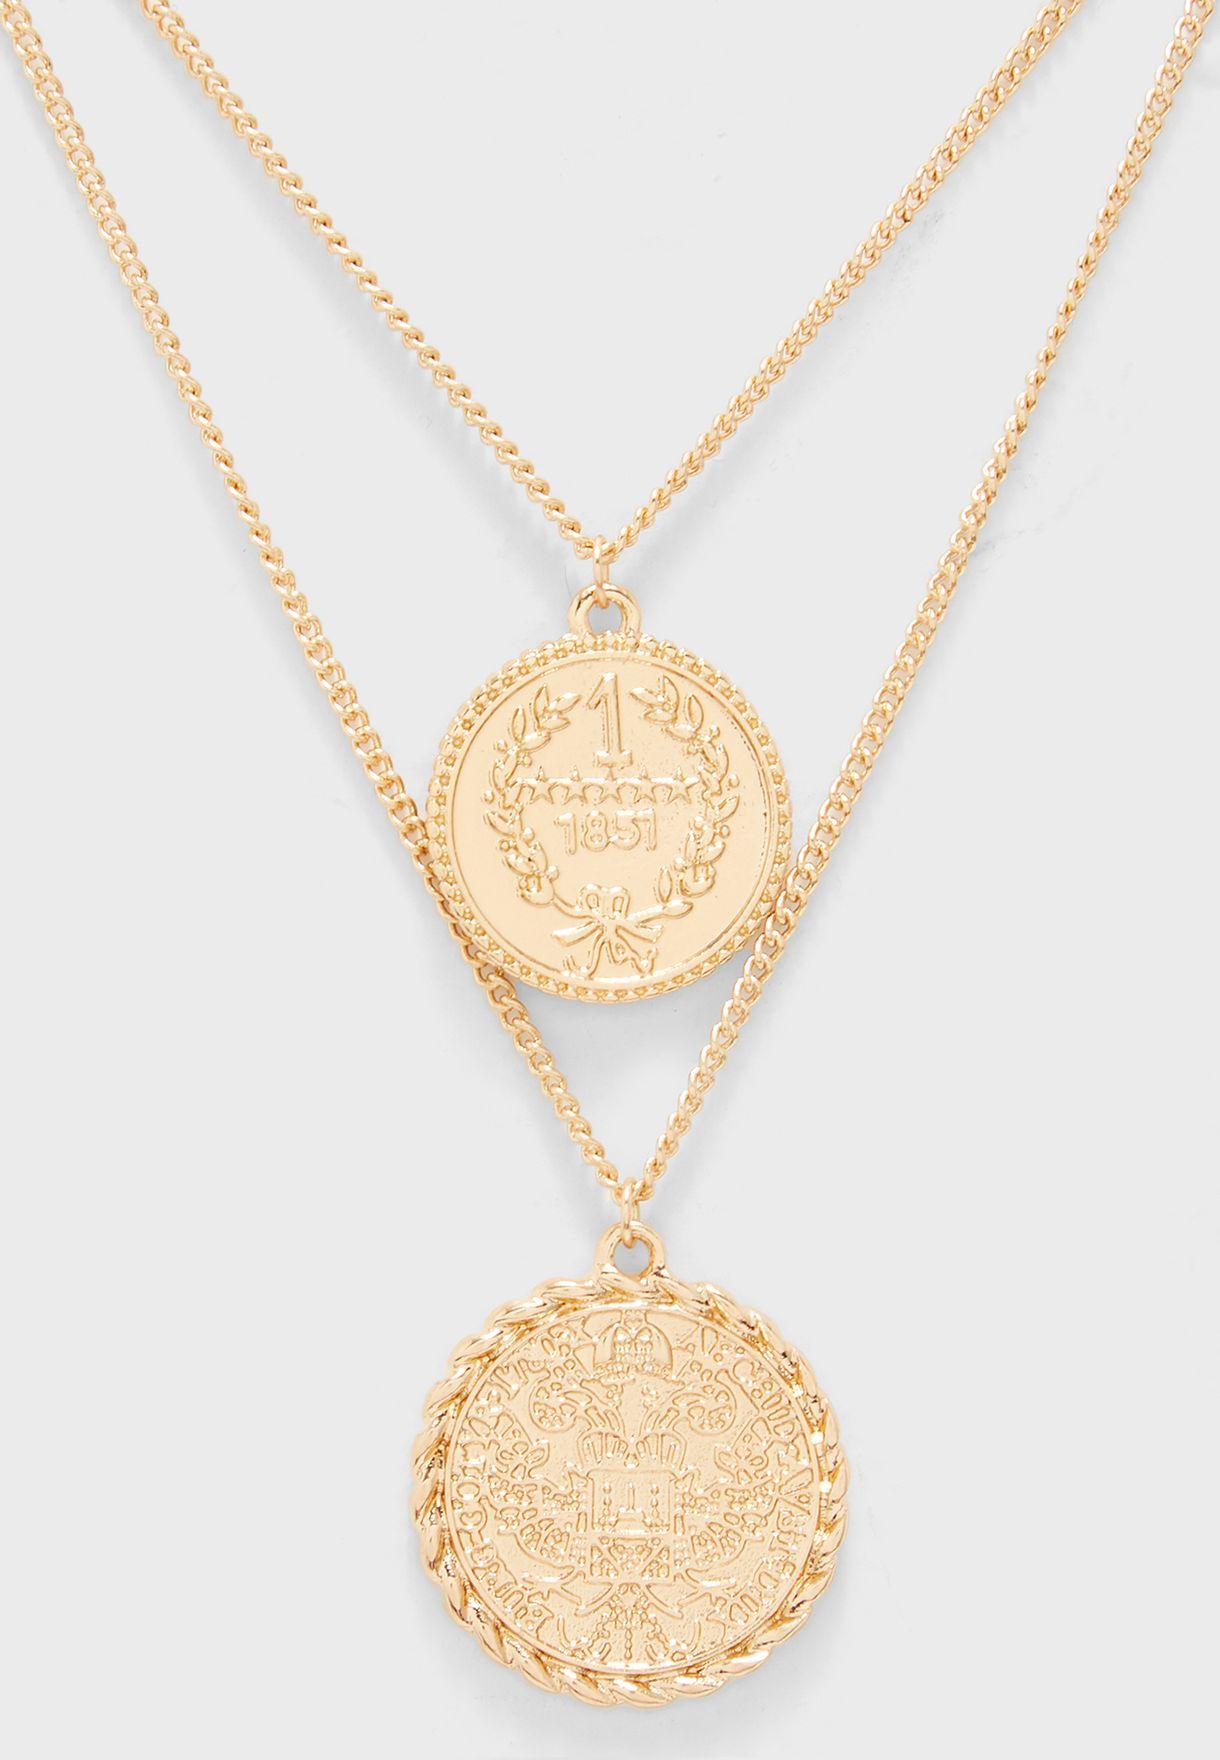 Karen Coin Layered Necklace